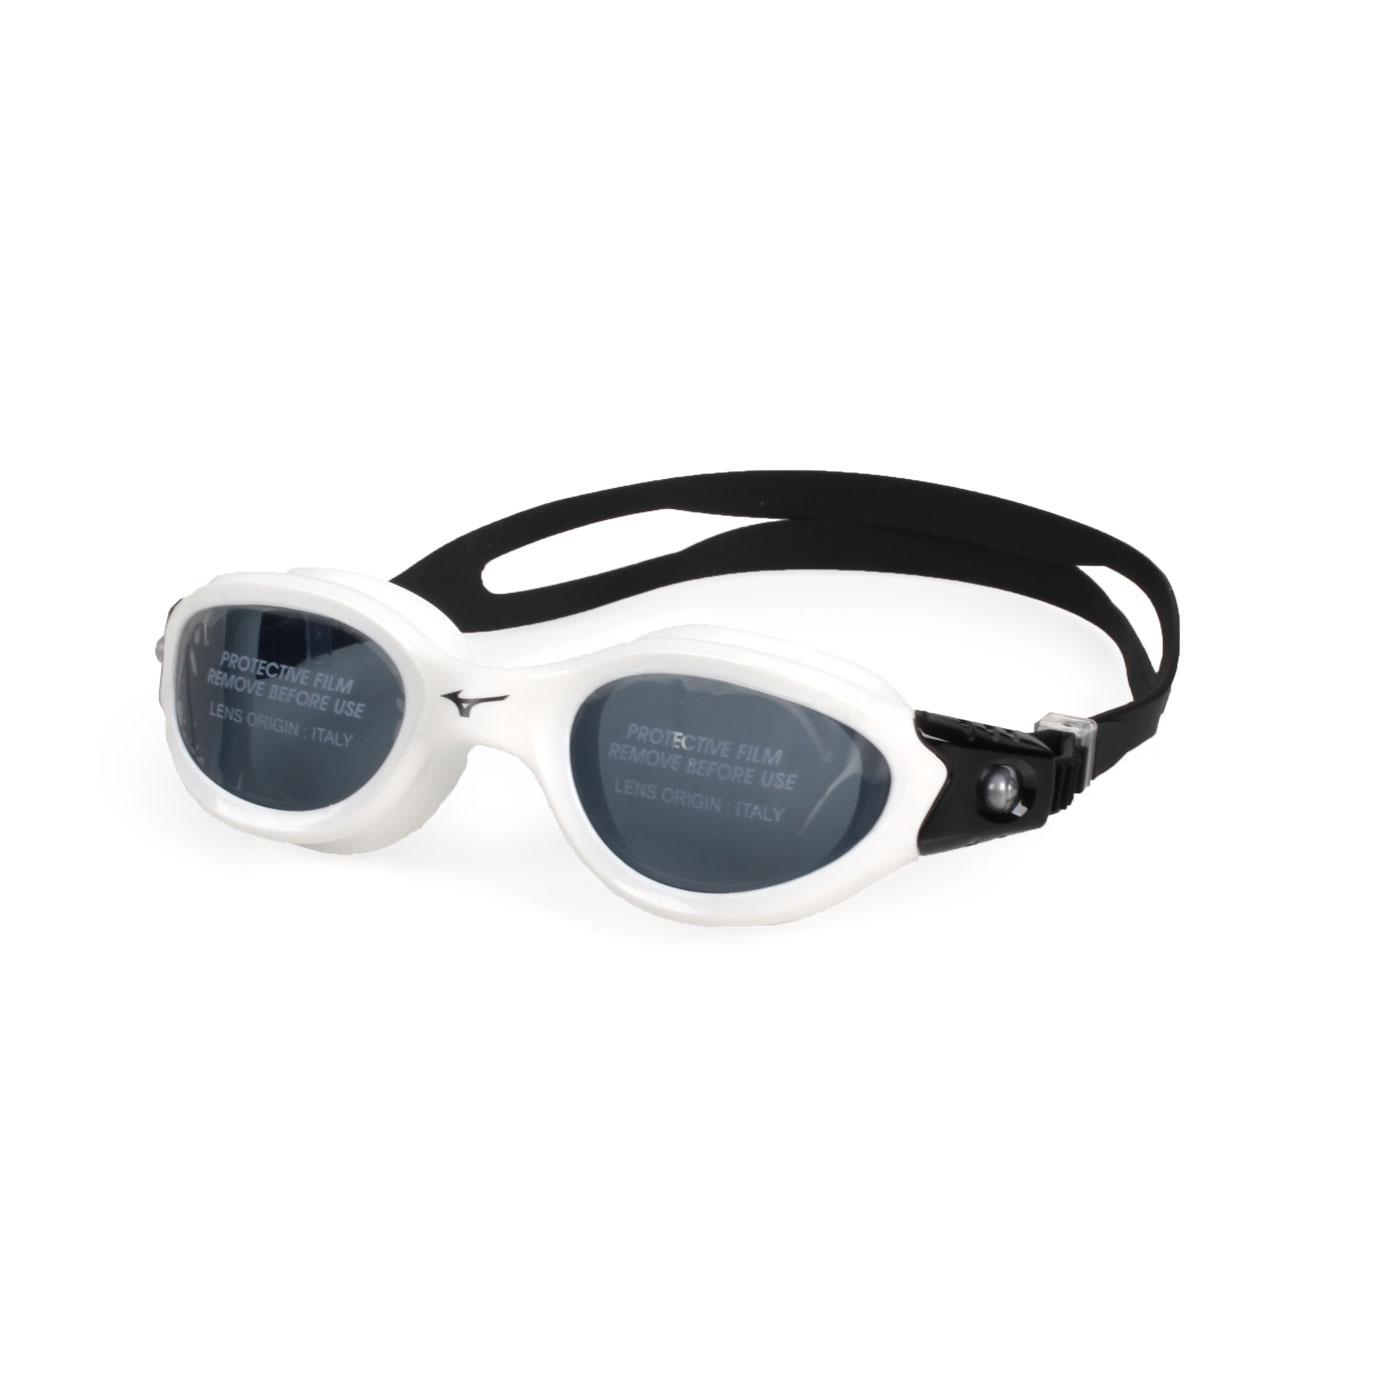 MIZUNO 泳鏡  SWIMN3TE800900-01 - 白黑